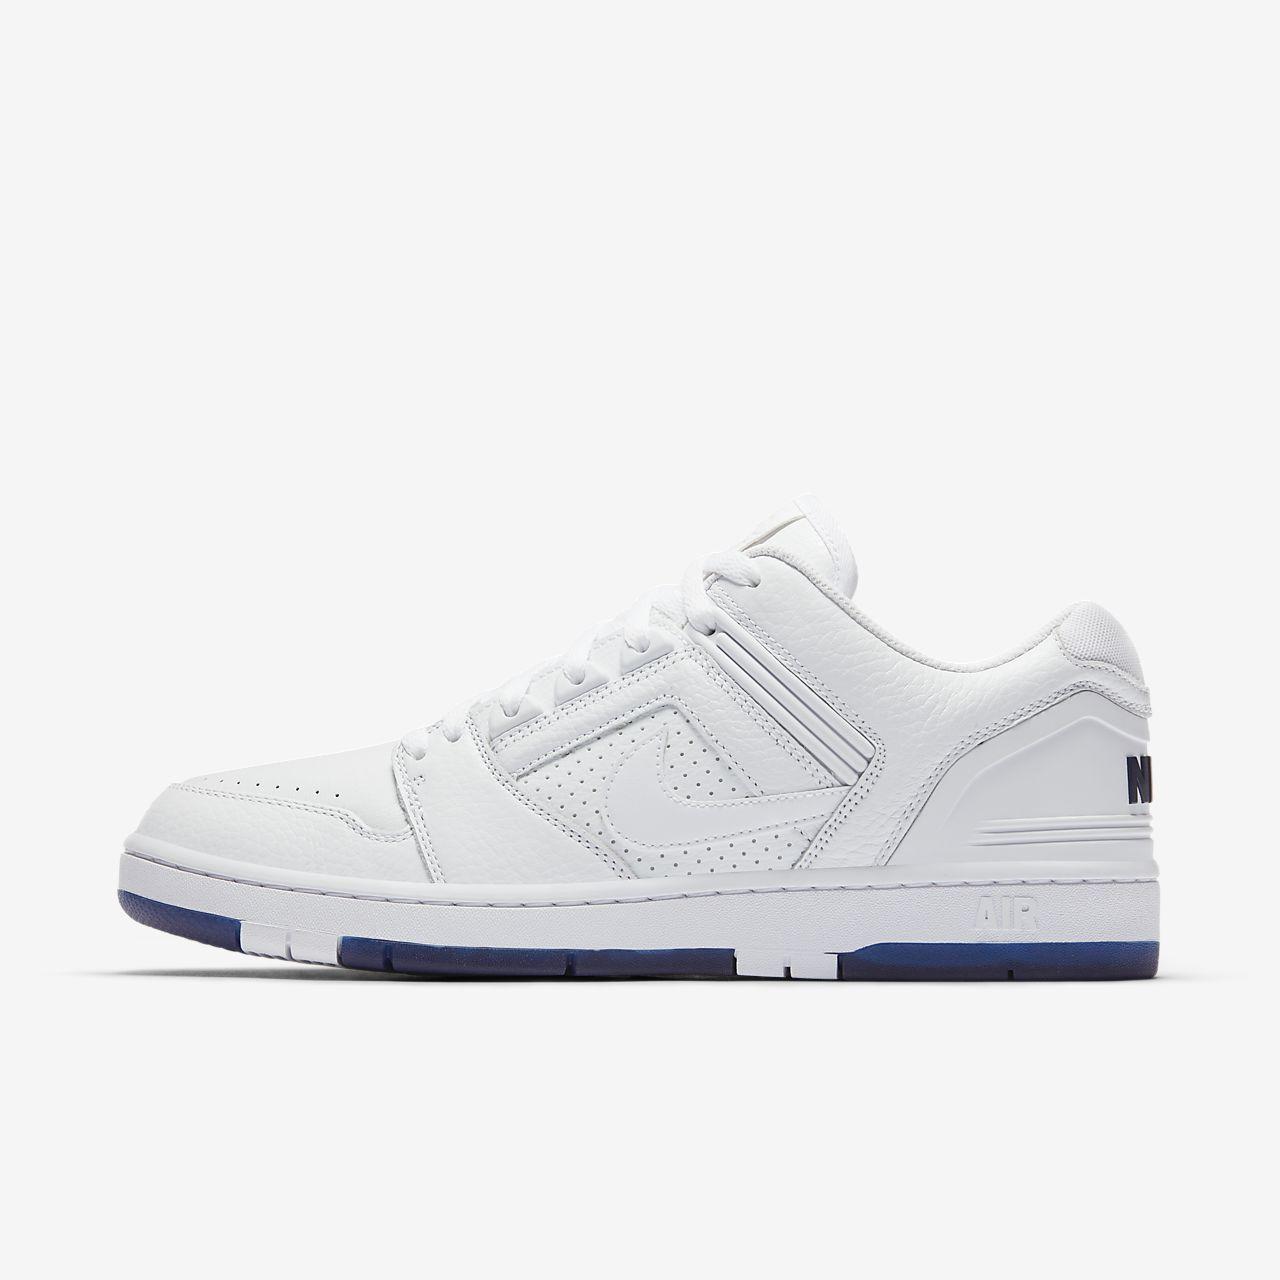 Low Chaussure Sb Pour Nike De Air Skateboard Homme Ii Force OkXPn0w8